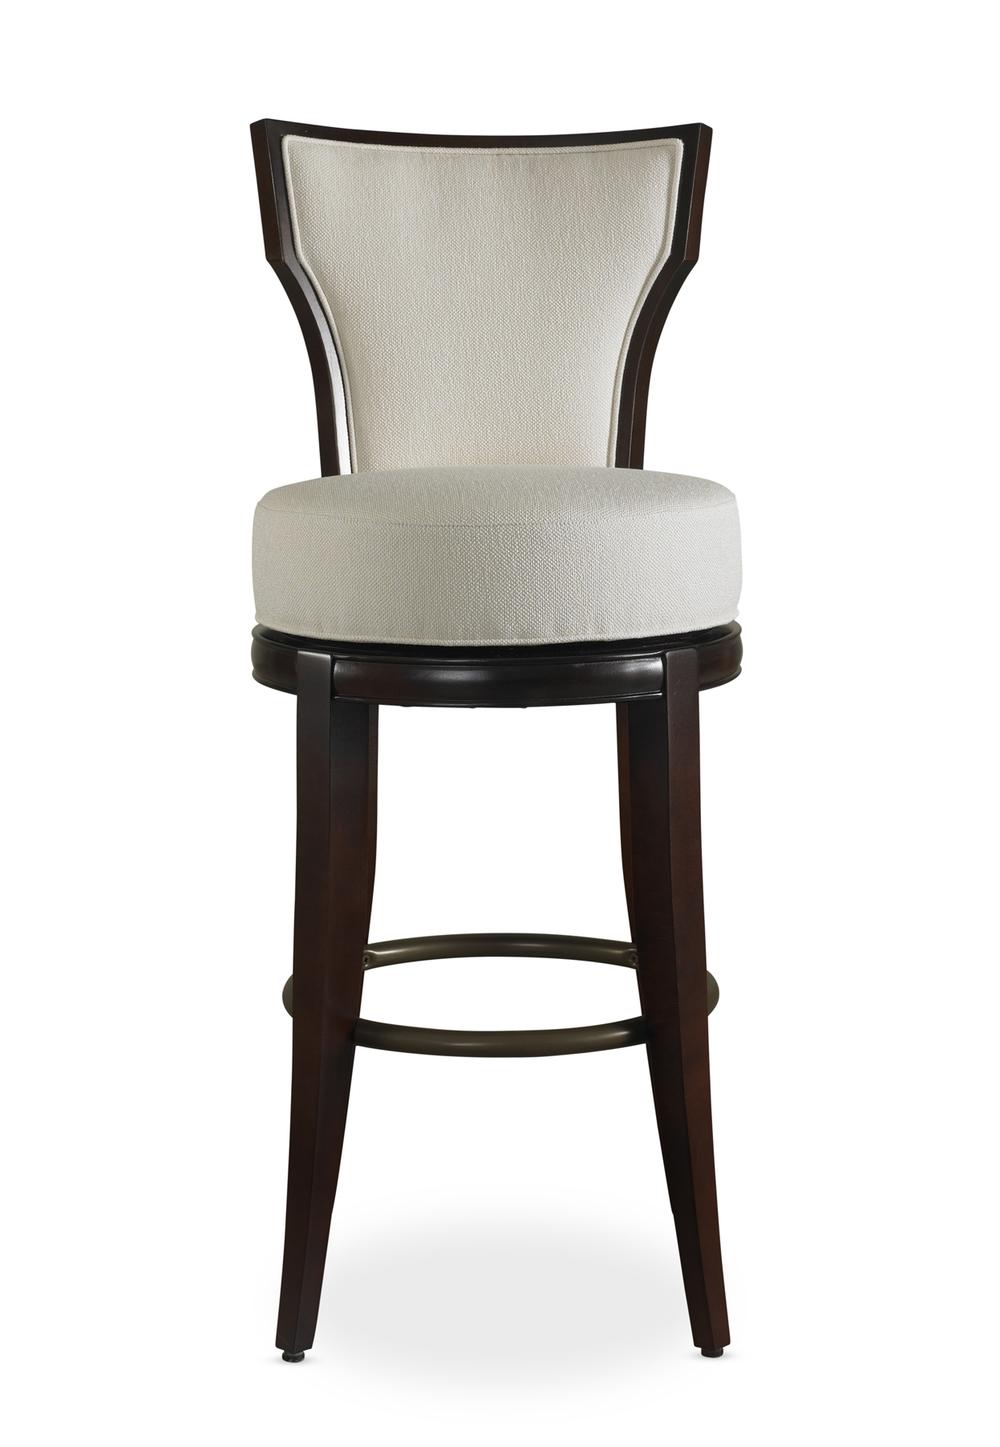 Designmaster Furniture - Brockton Bar Stool